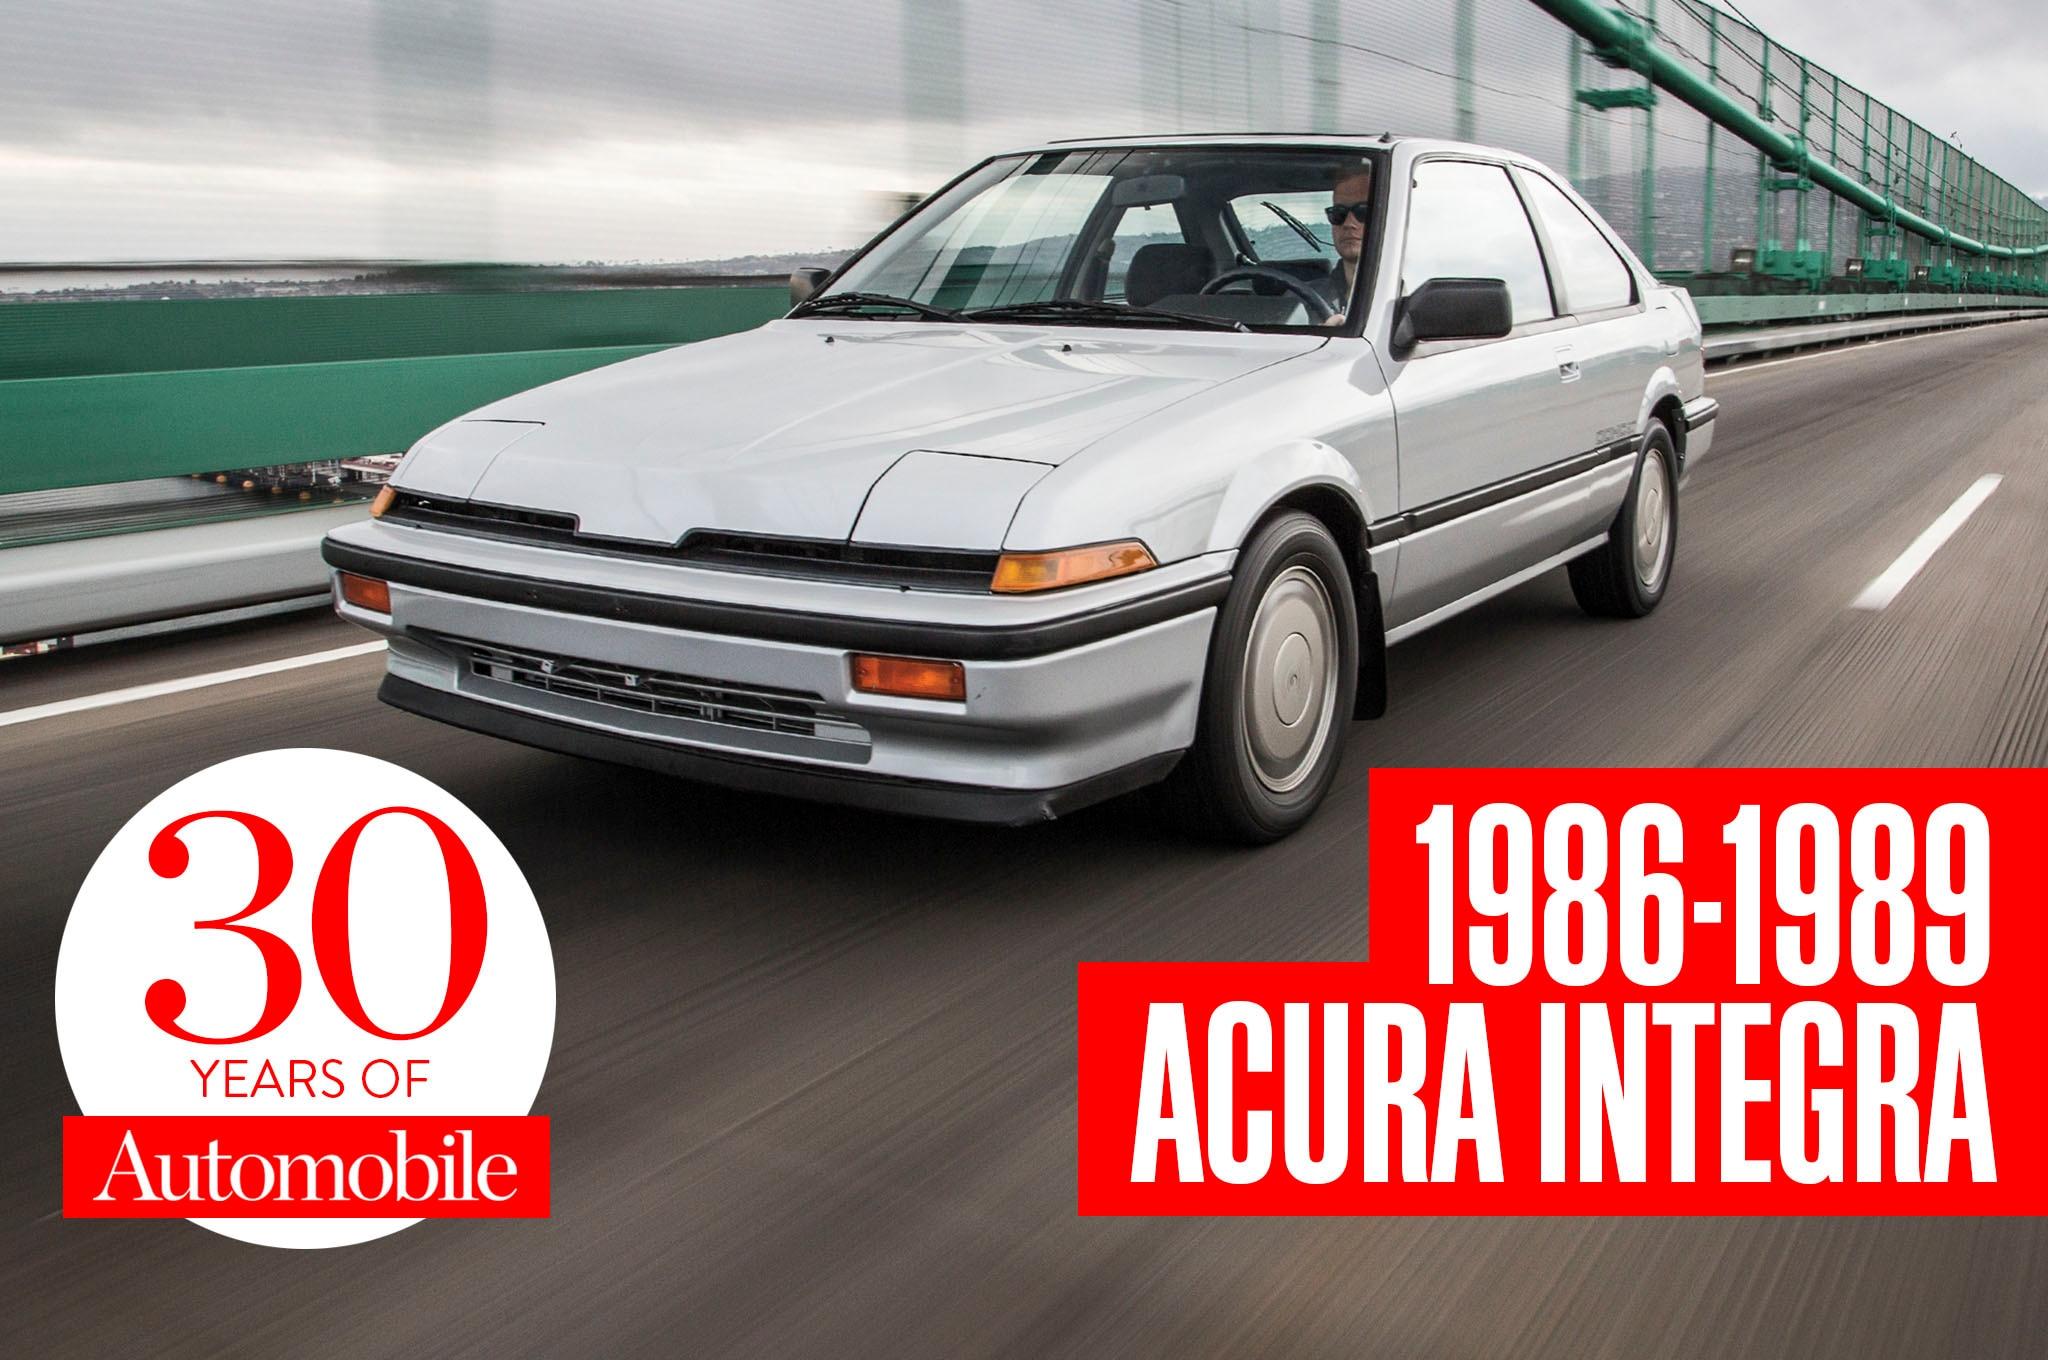 2001 Acura Integra Ls >> Collectible Classic: 1986-1989 Acura Integra